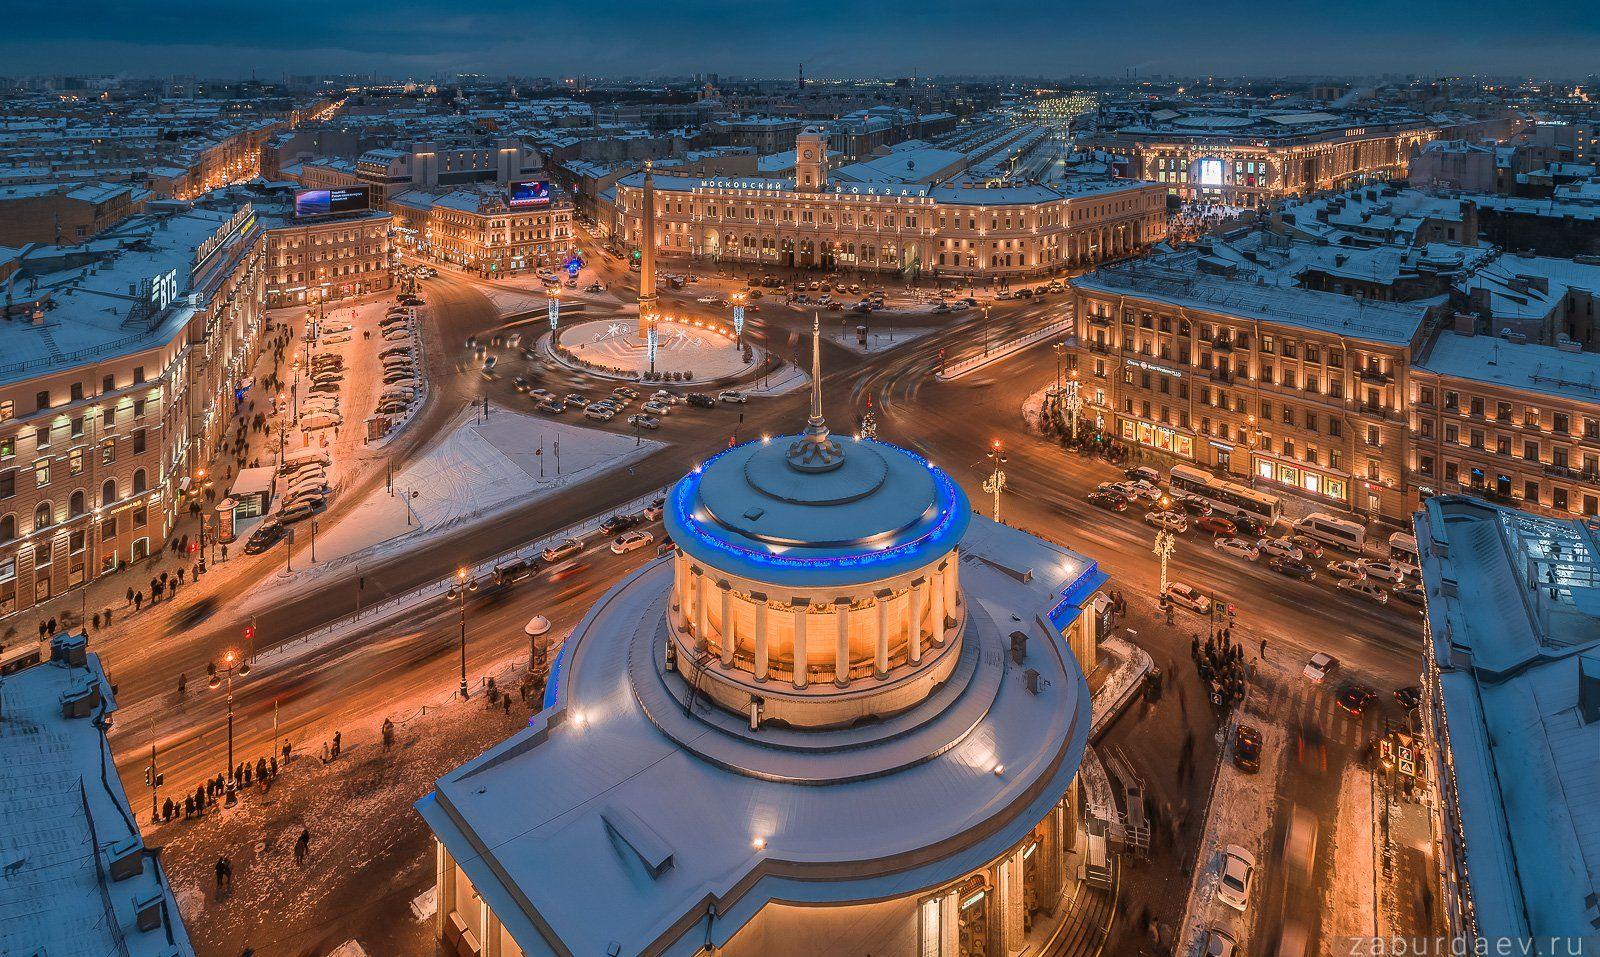 россия, петербург, санкт-петербург, вечер, зима, новый год, площадь, дрон, квадрокоптер, Станислав Забурдаев